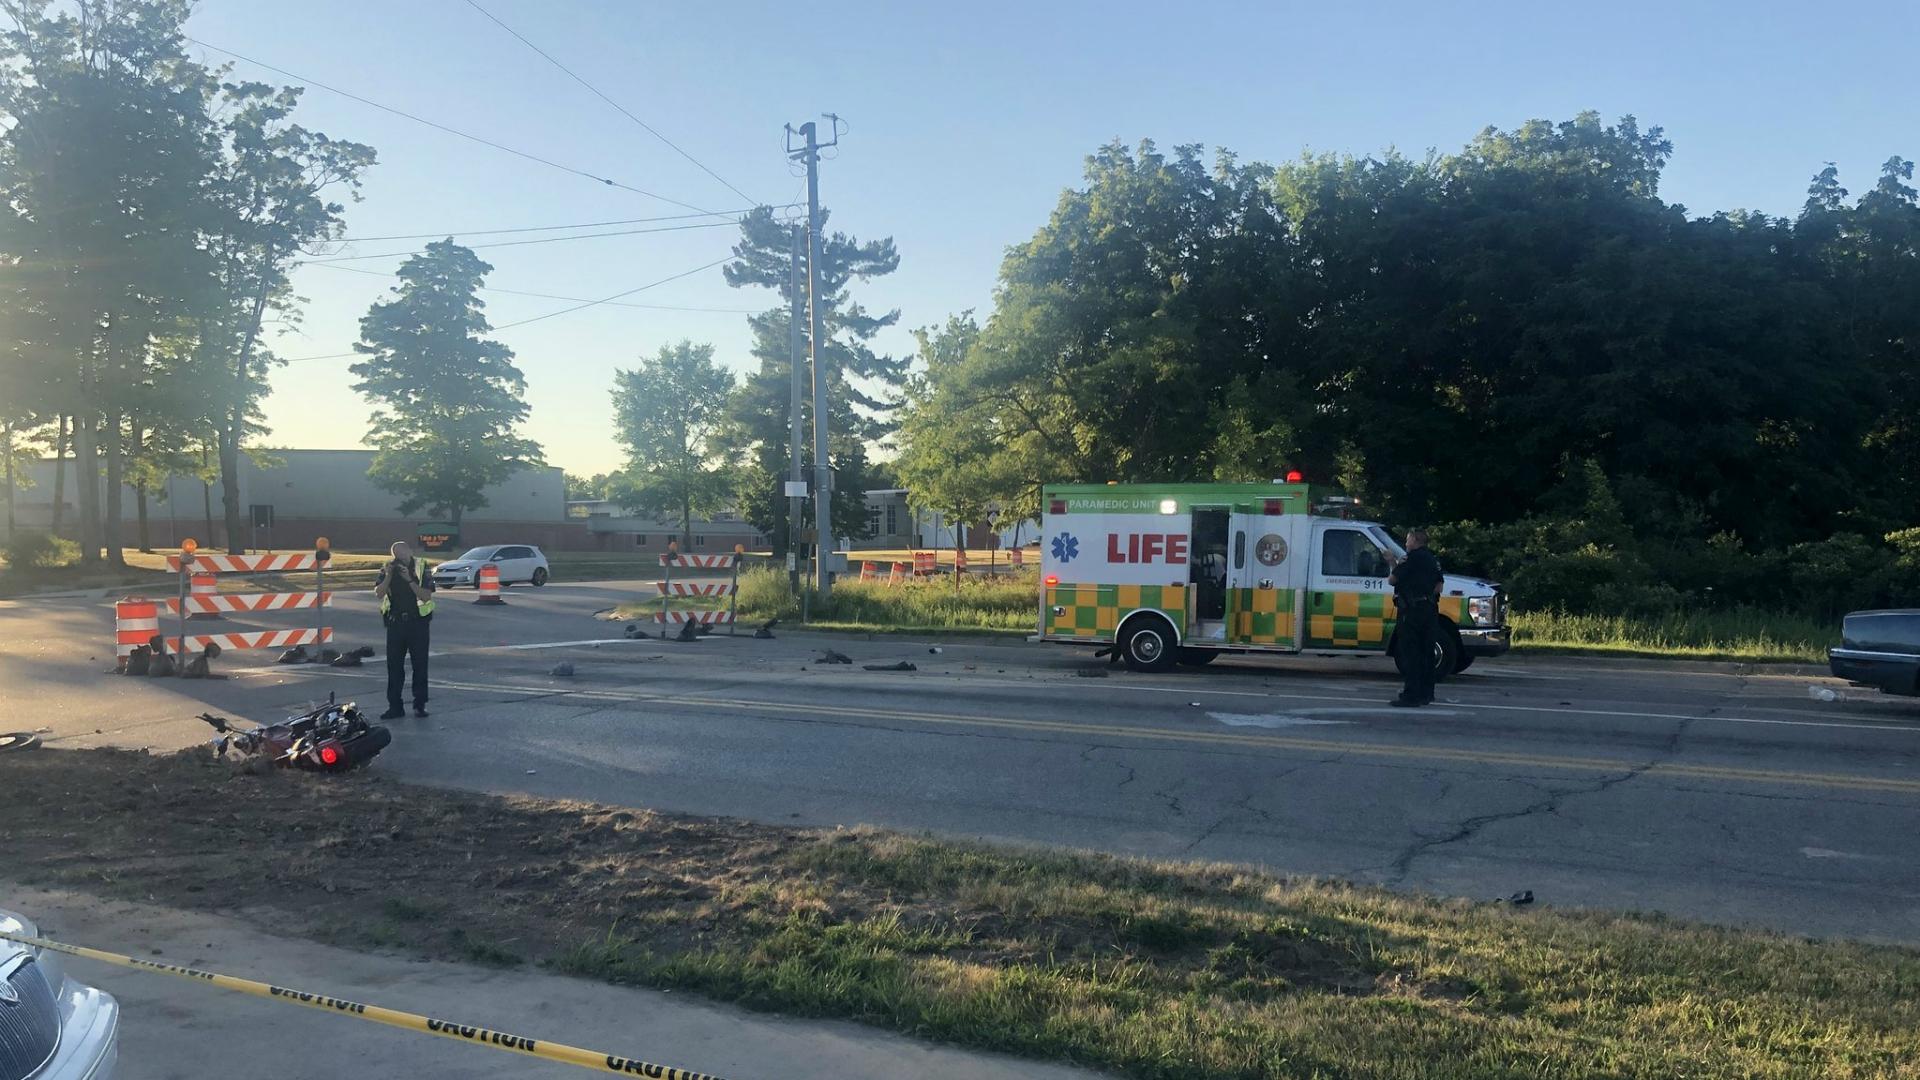 walker wilson avenue leonard street crash 071718_1531874335845.jpg.jpg